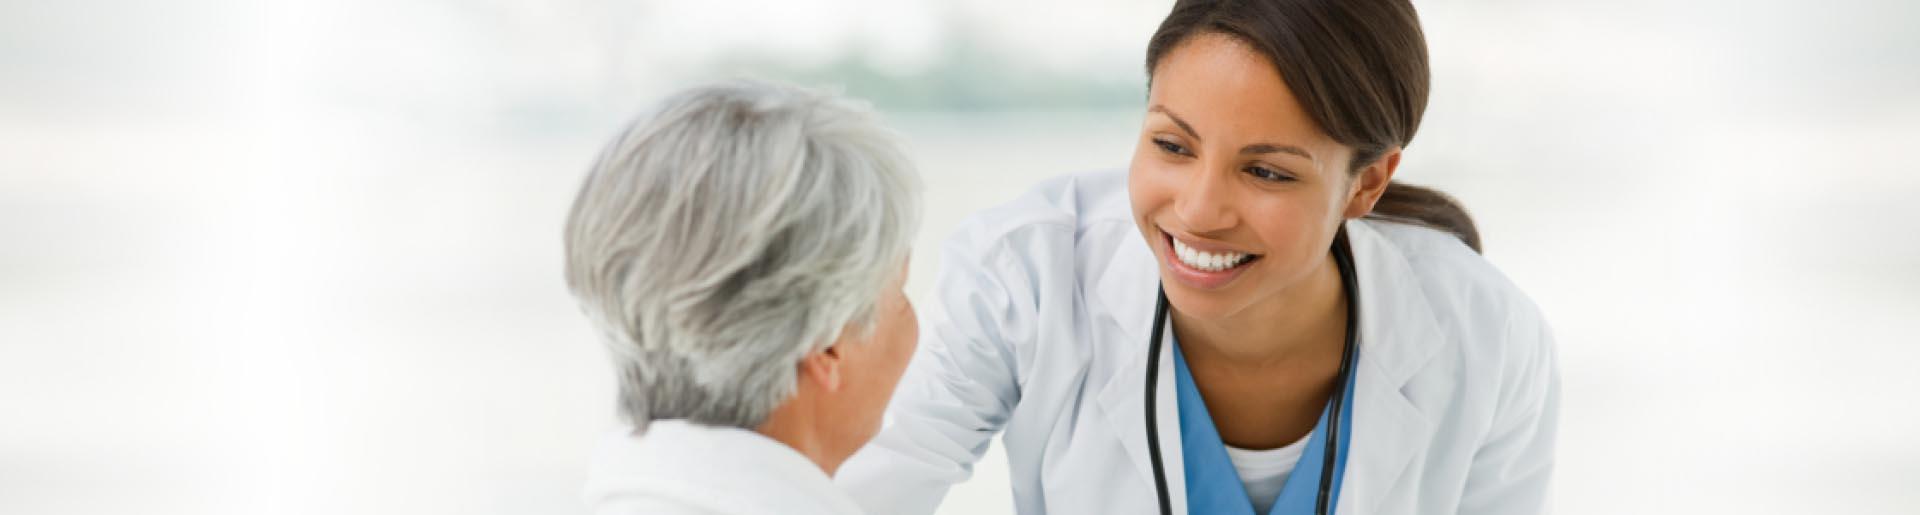 Sanford Health: Health Lives Here